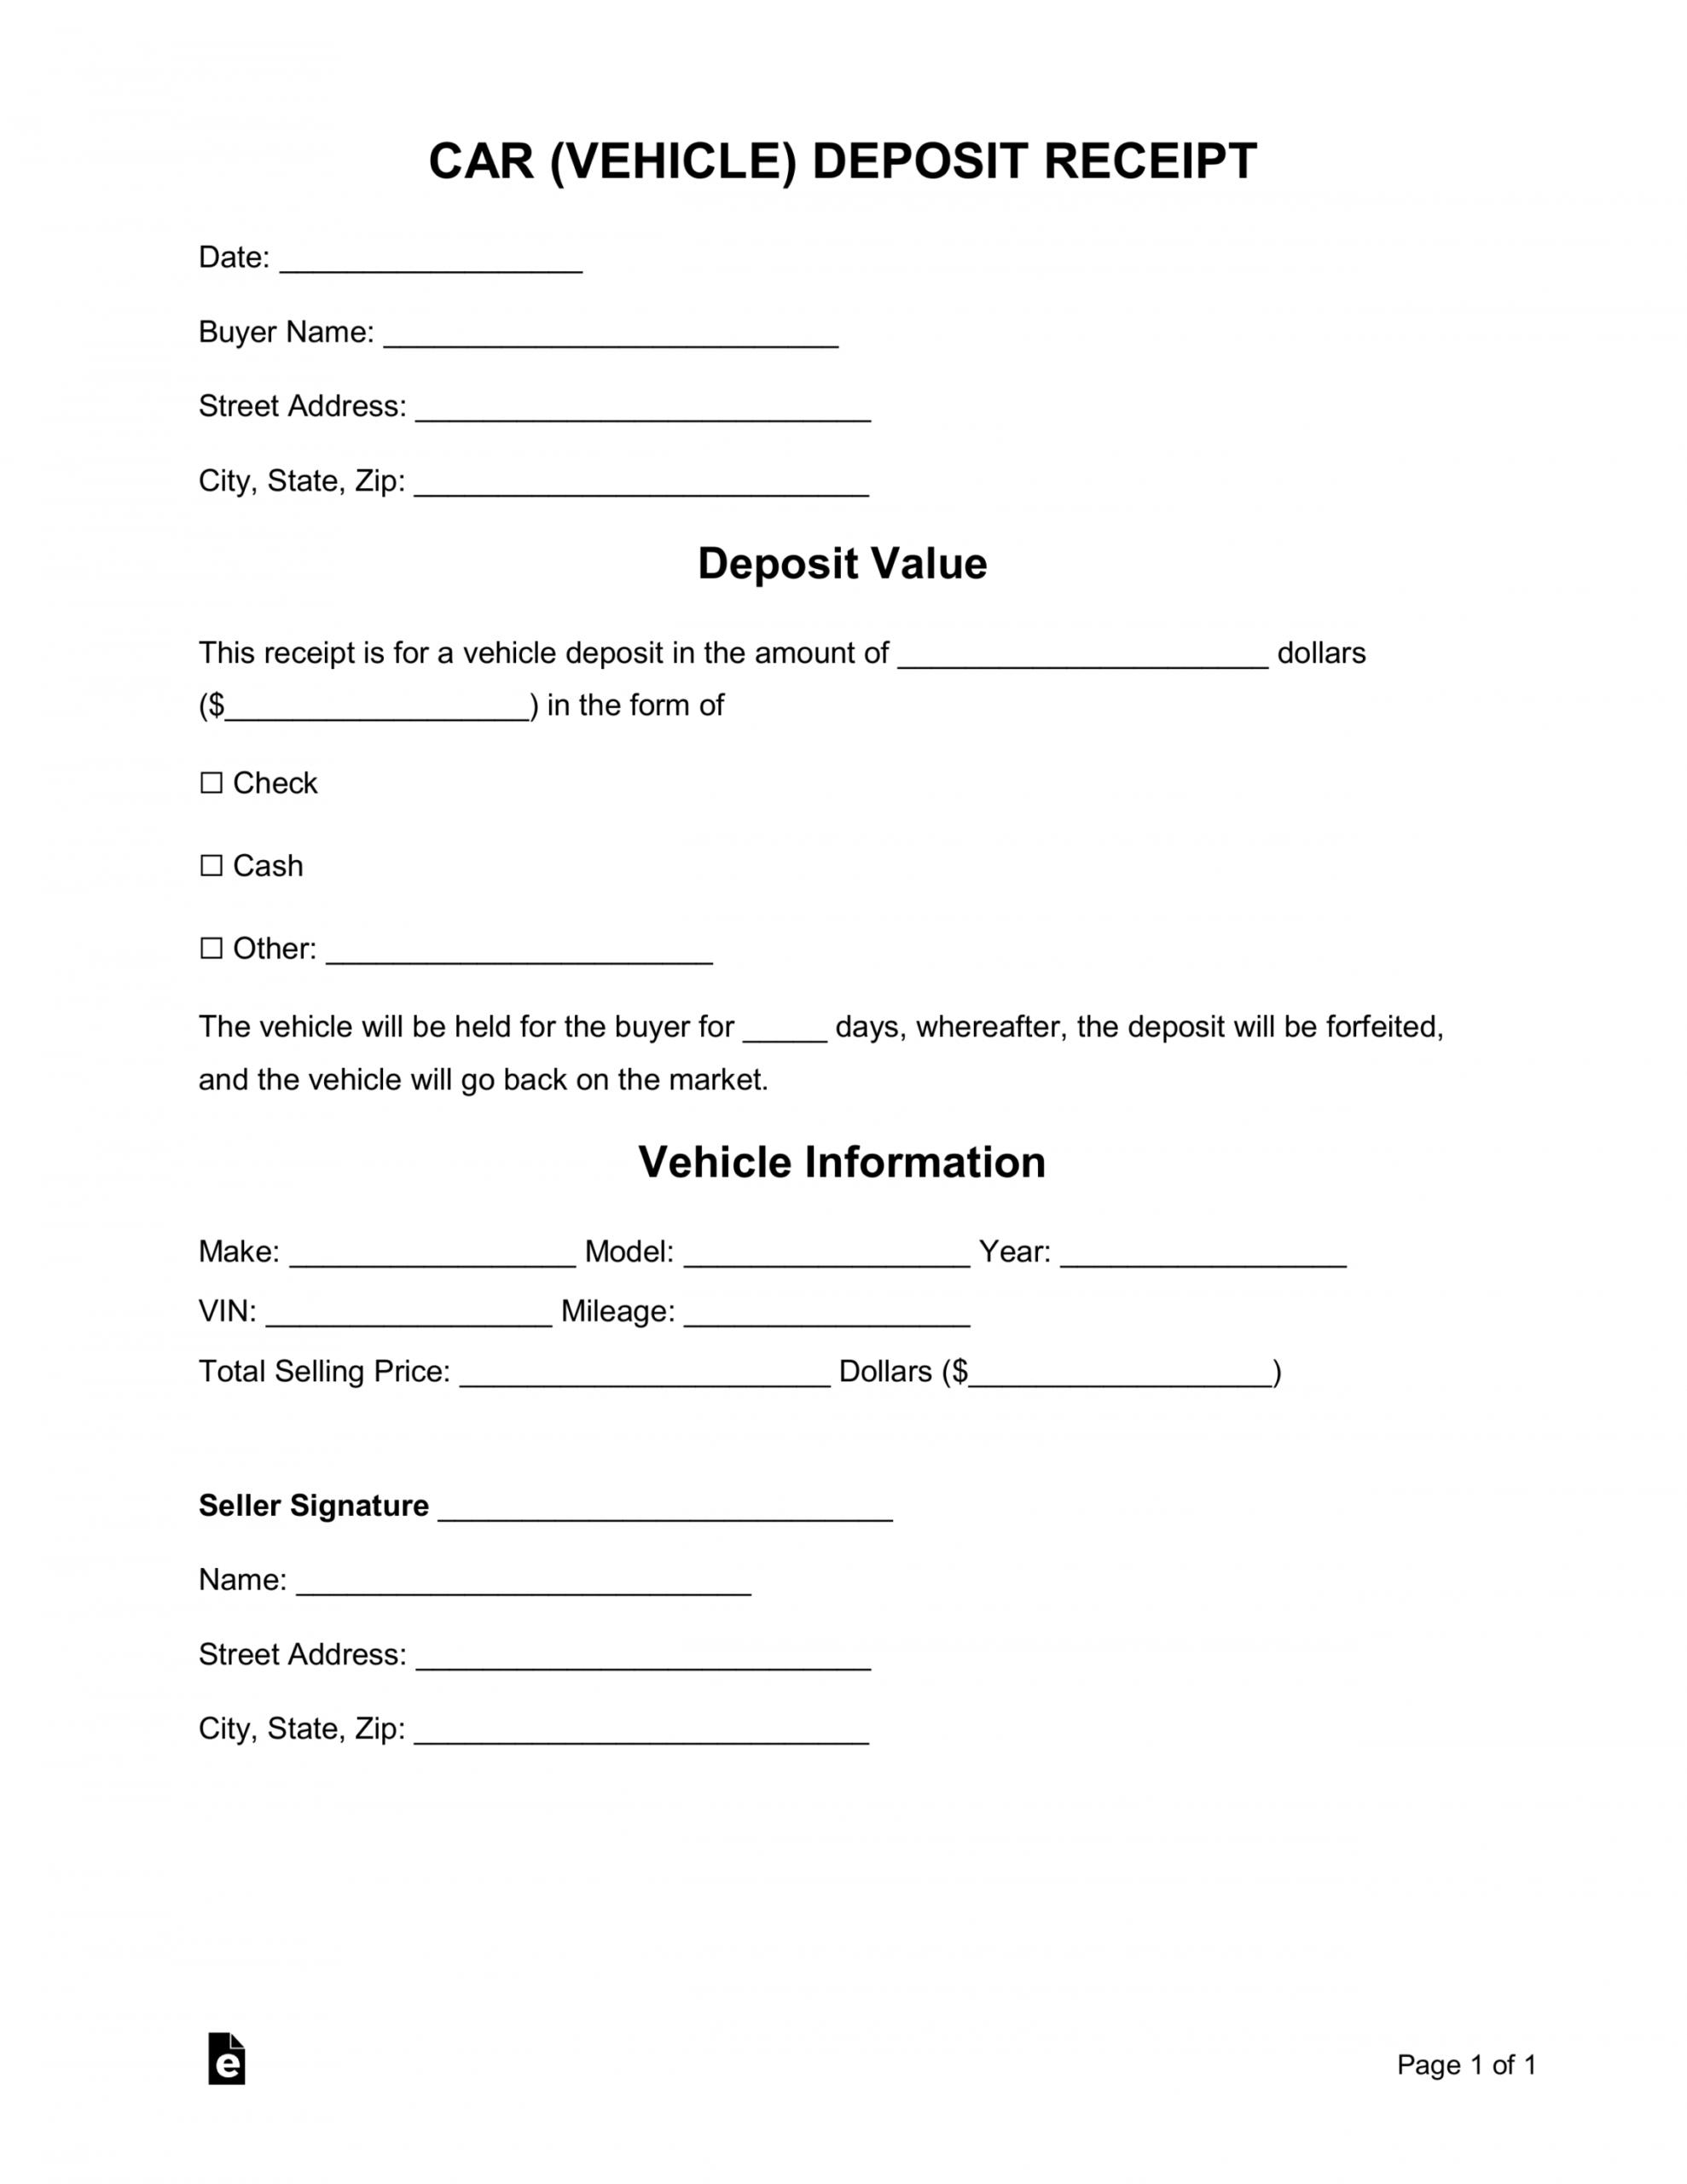 printable free car vehicle purchase deposit receipt template  word vehicle deposit agreement form pdf